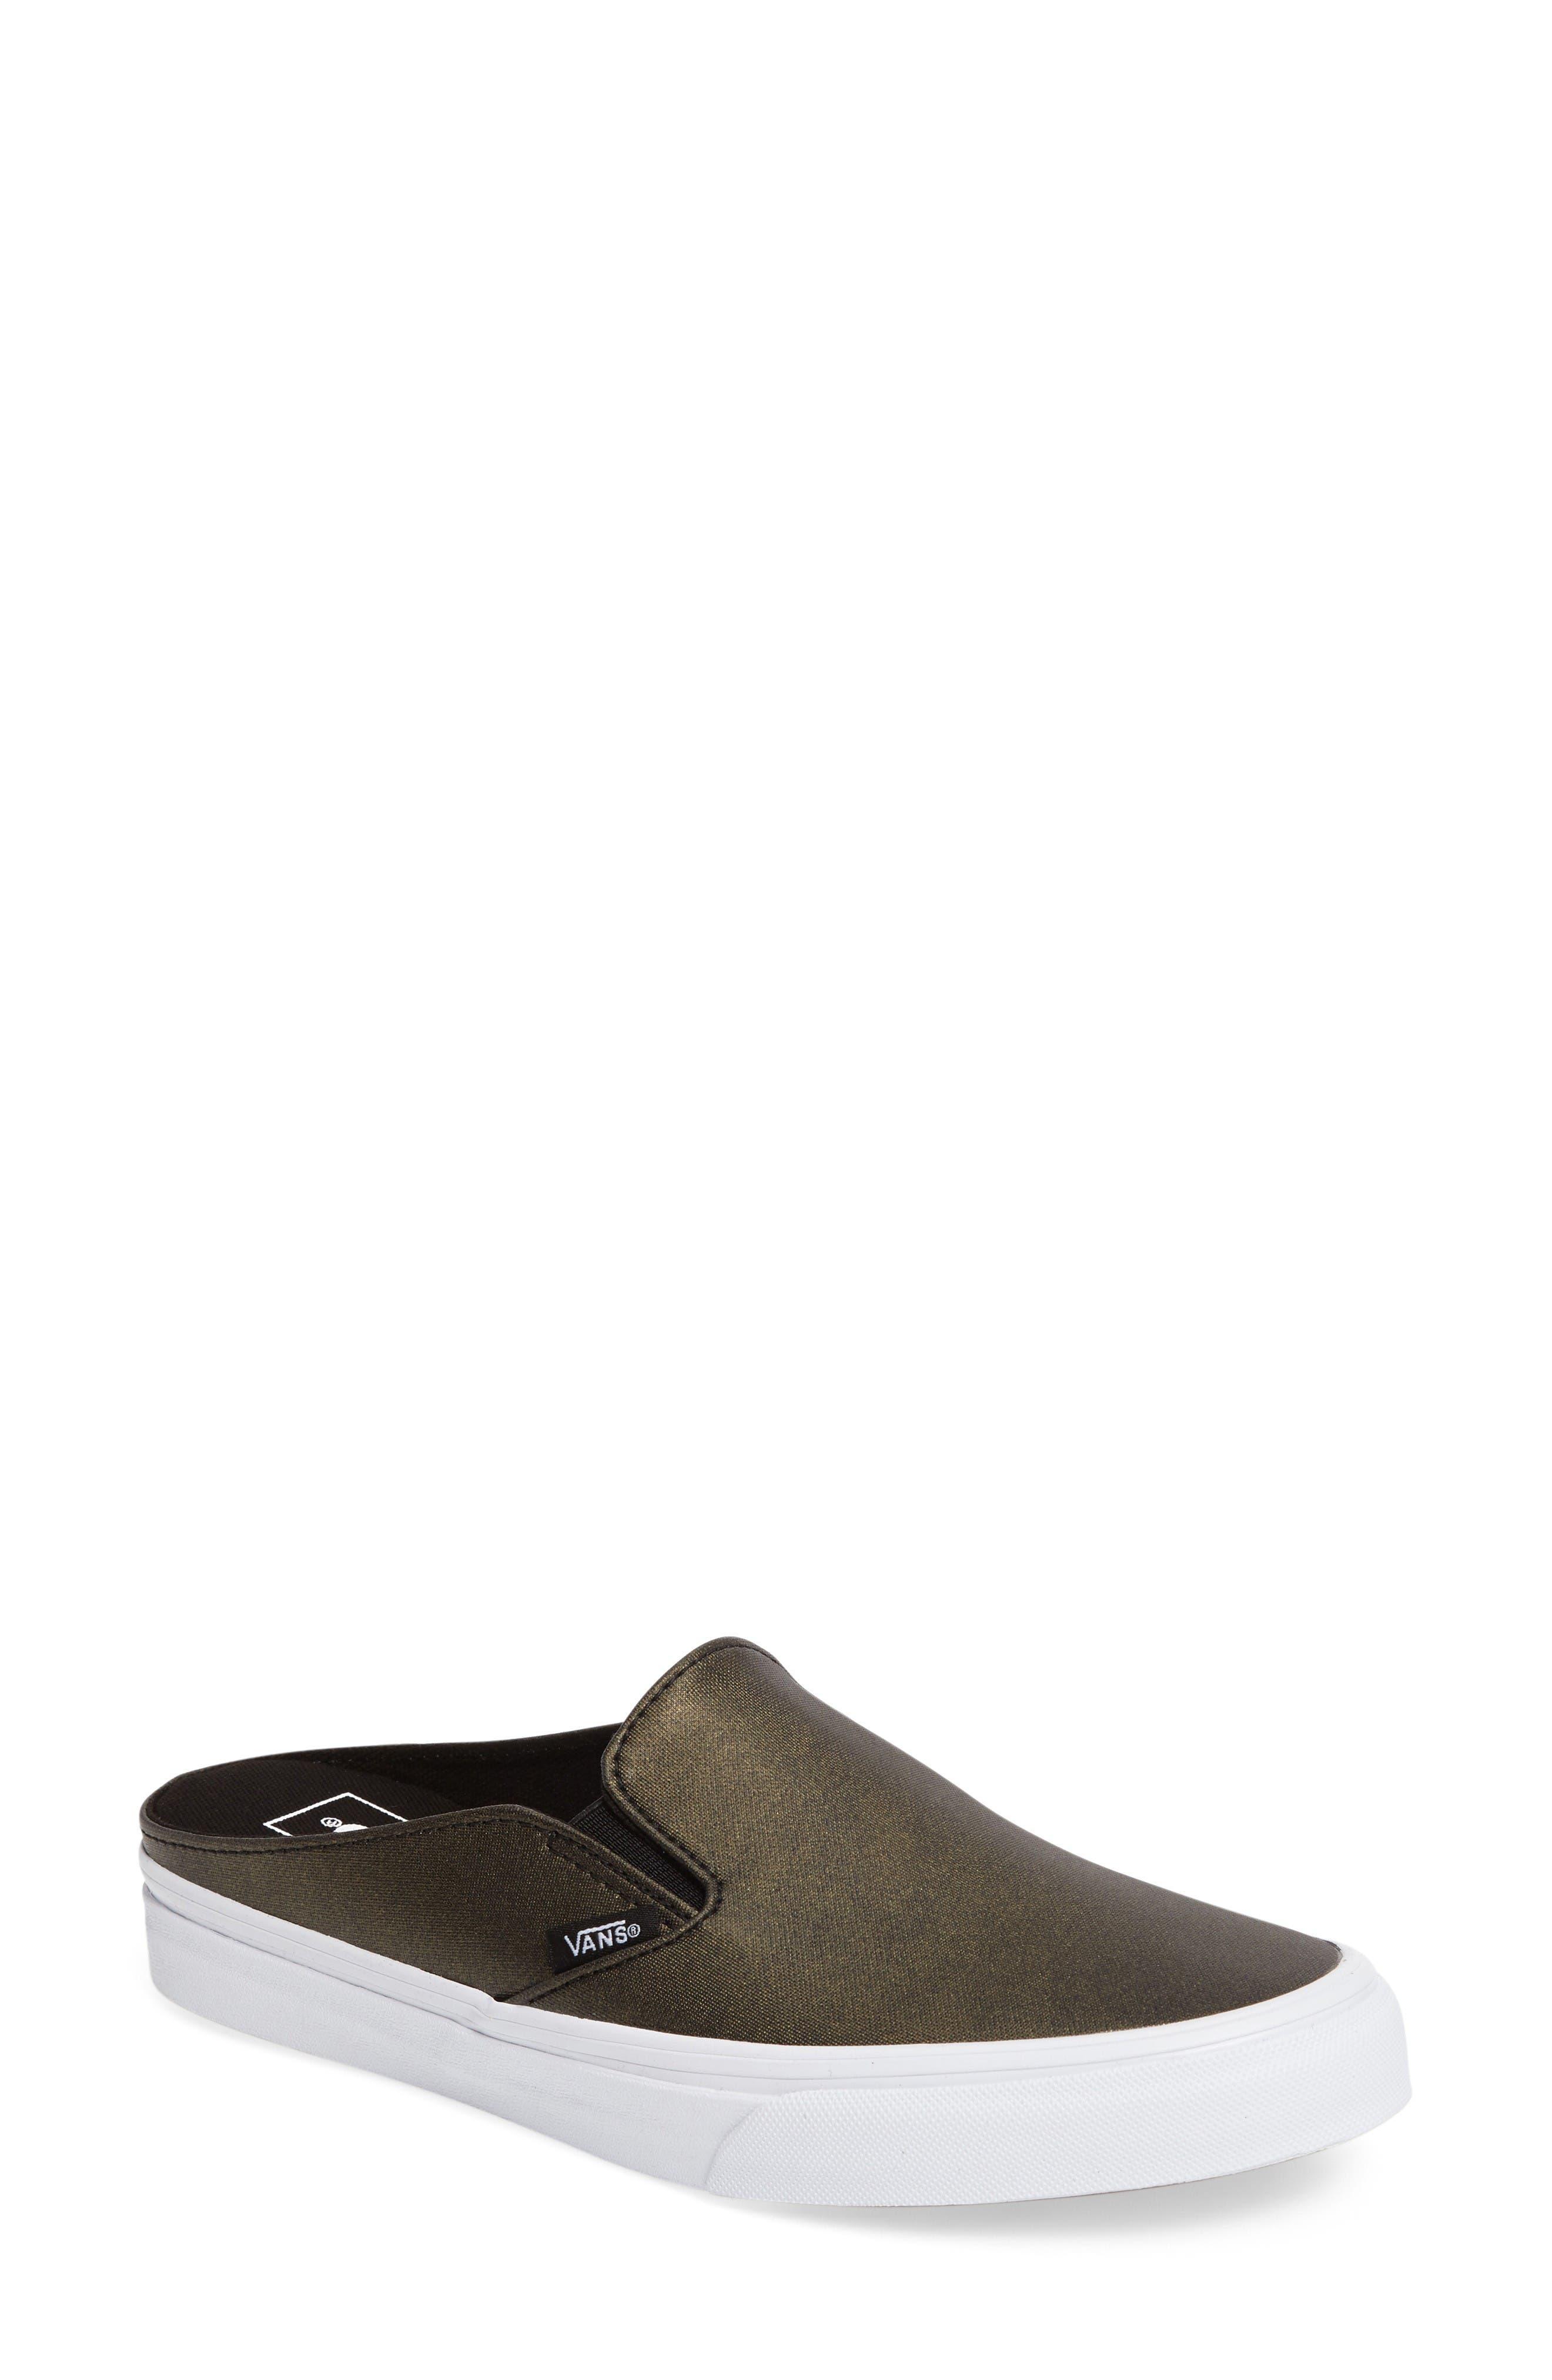 Alternate Image 1 Selected - Vans 'Classic' Slip-On Sneaker Mule (Women)